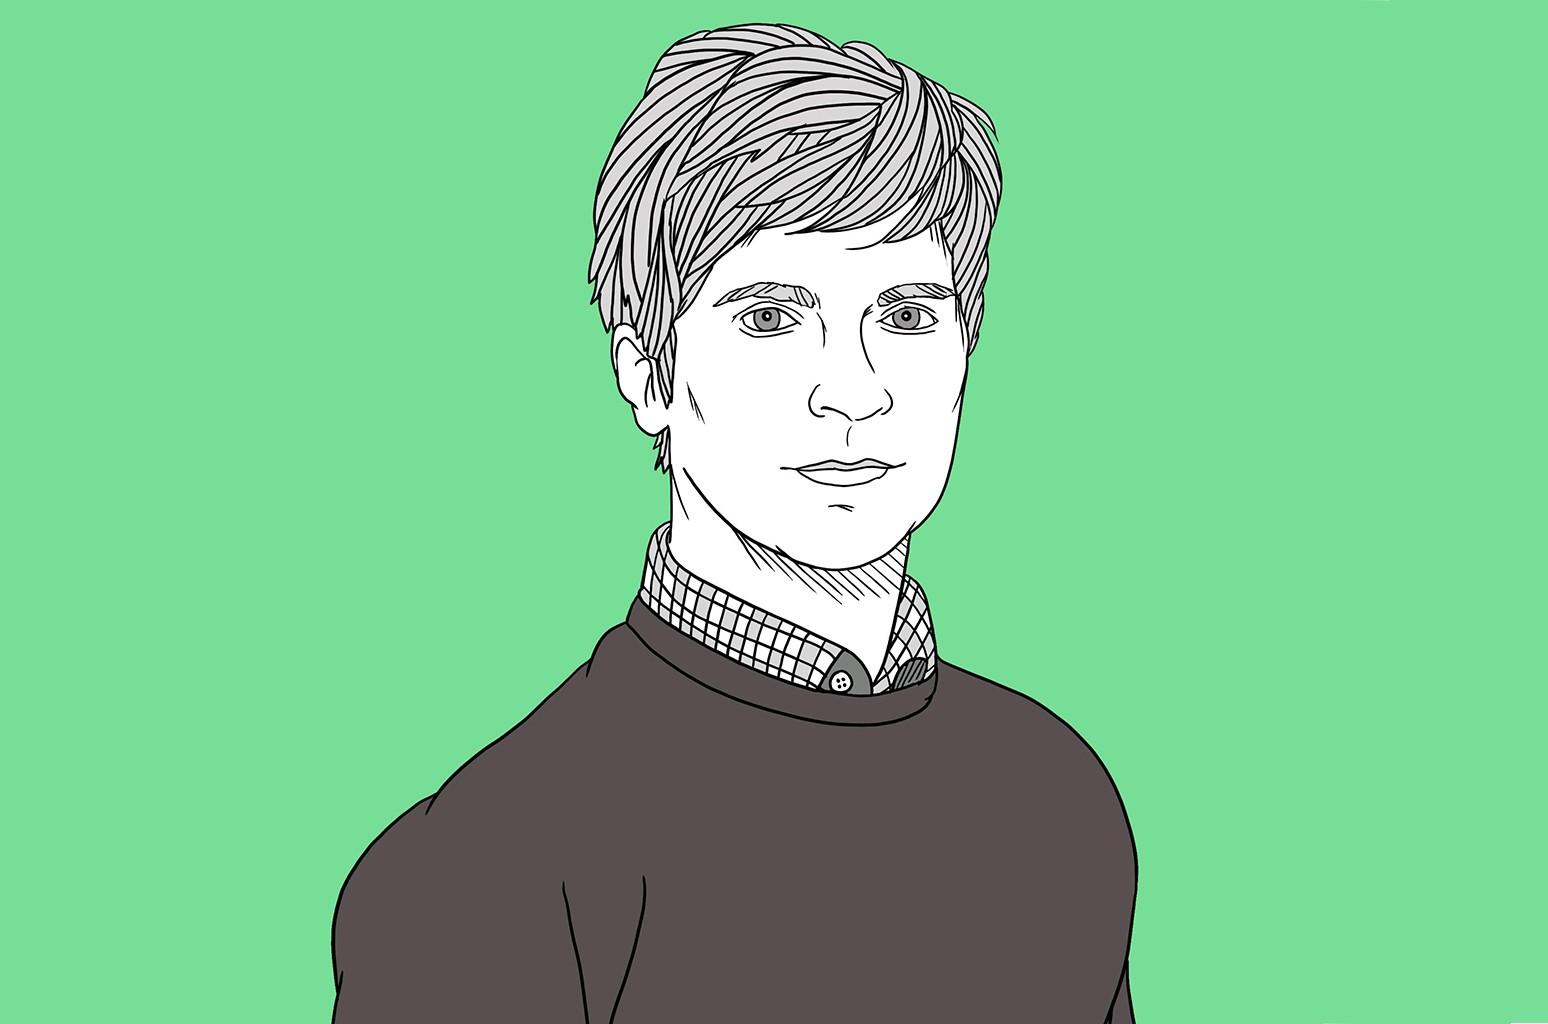 An illustration of Matthew Caws